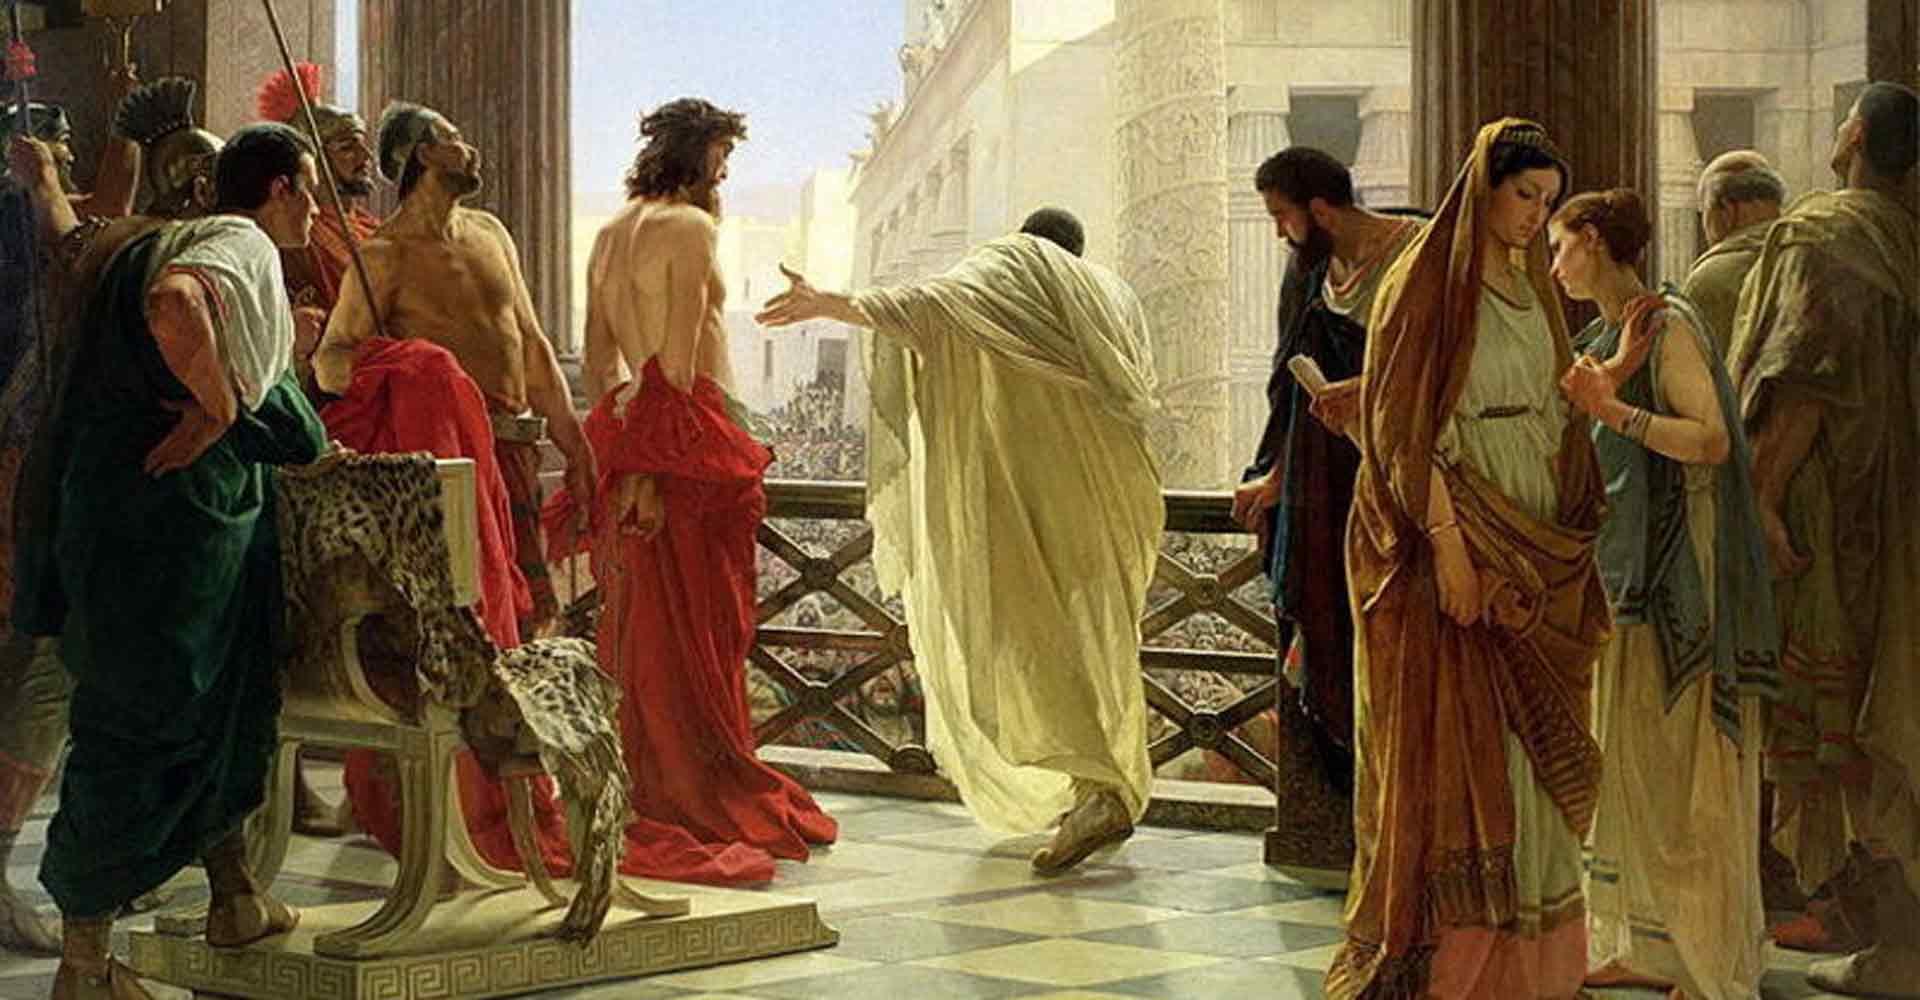 Pilate Judges Jesus Christ